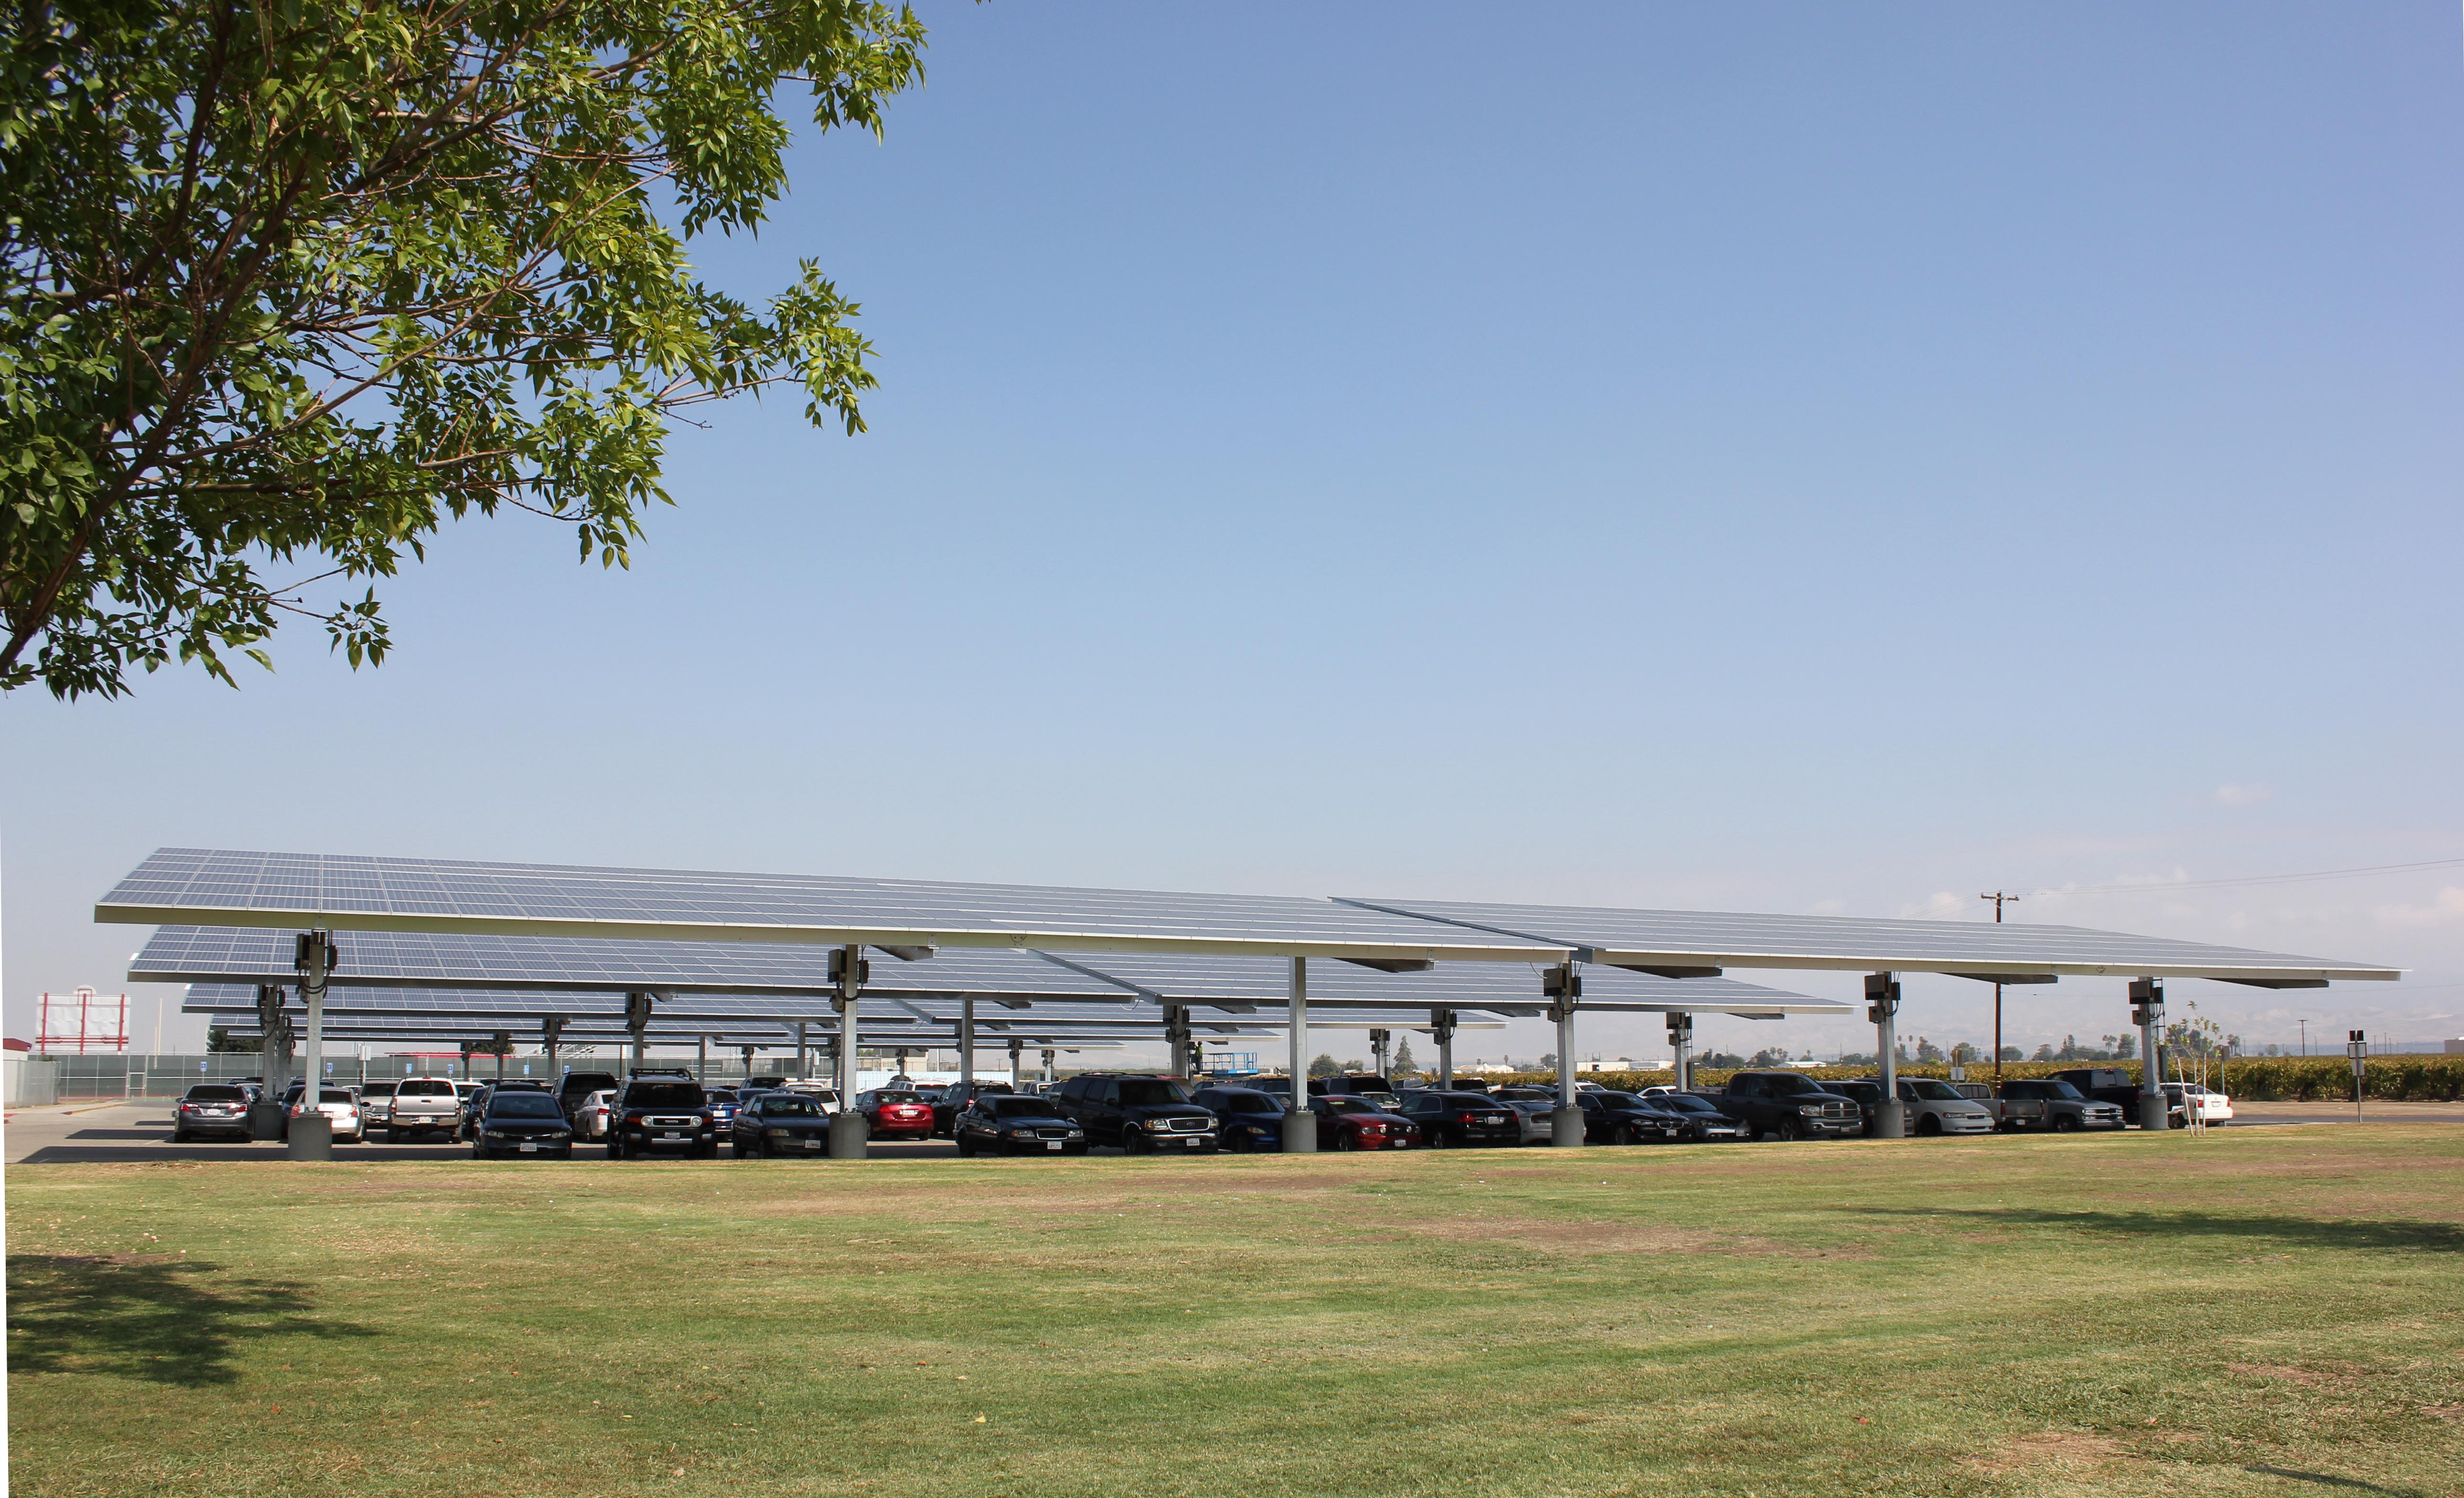 Carport shown with SunPower solar panels on them, providing solar energy and shade for cars.